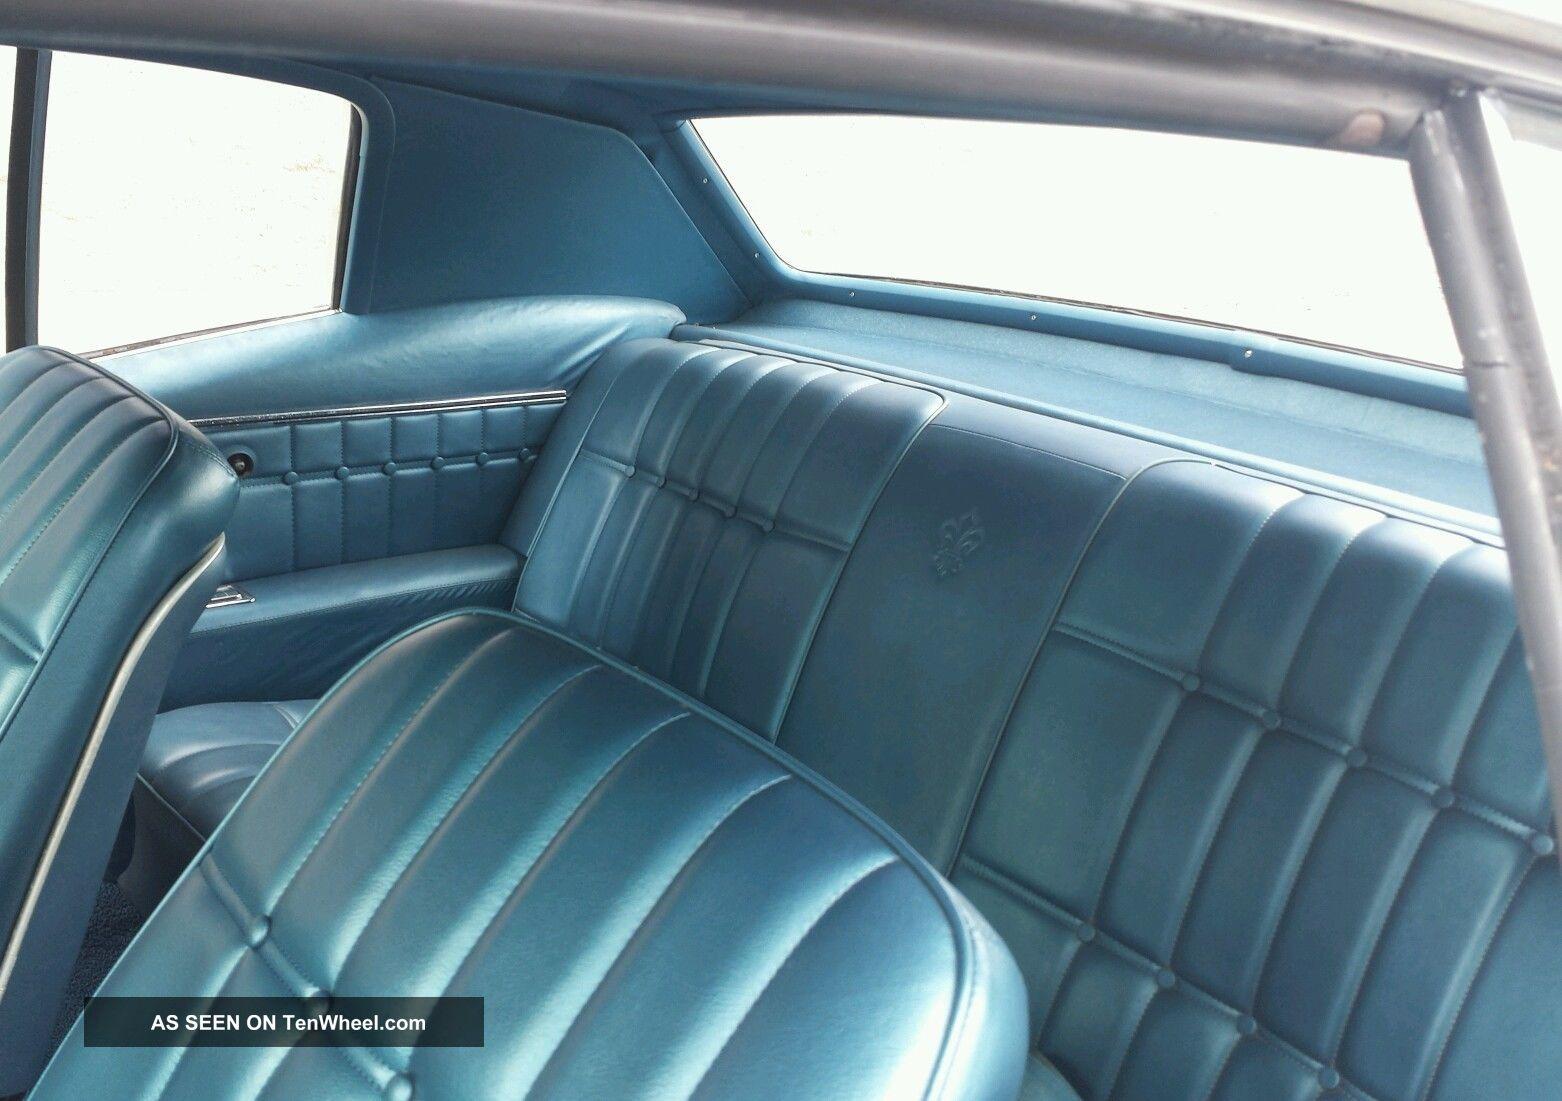 1968 Chevrolet Caprice 396 Th400 Buckets Console Tilt Wheel